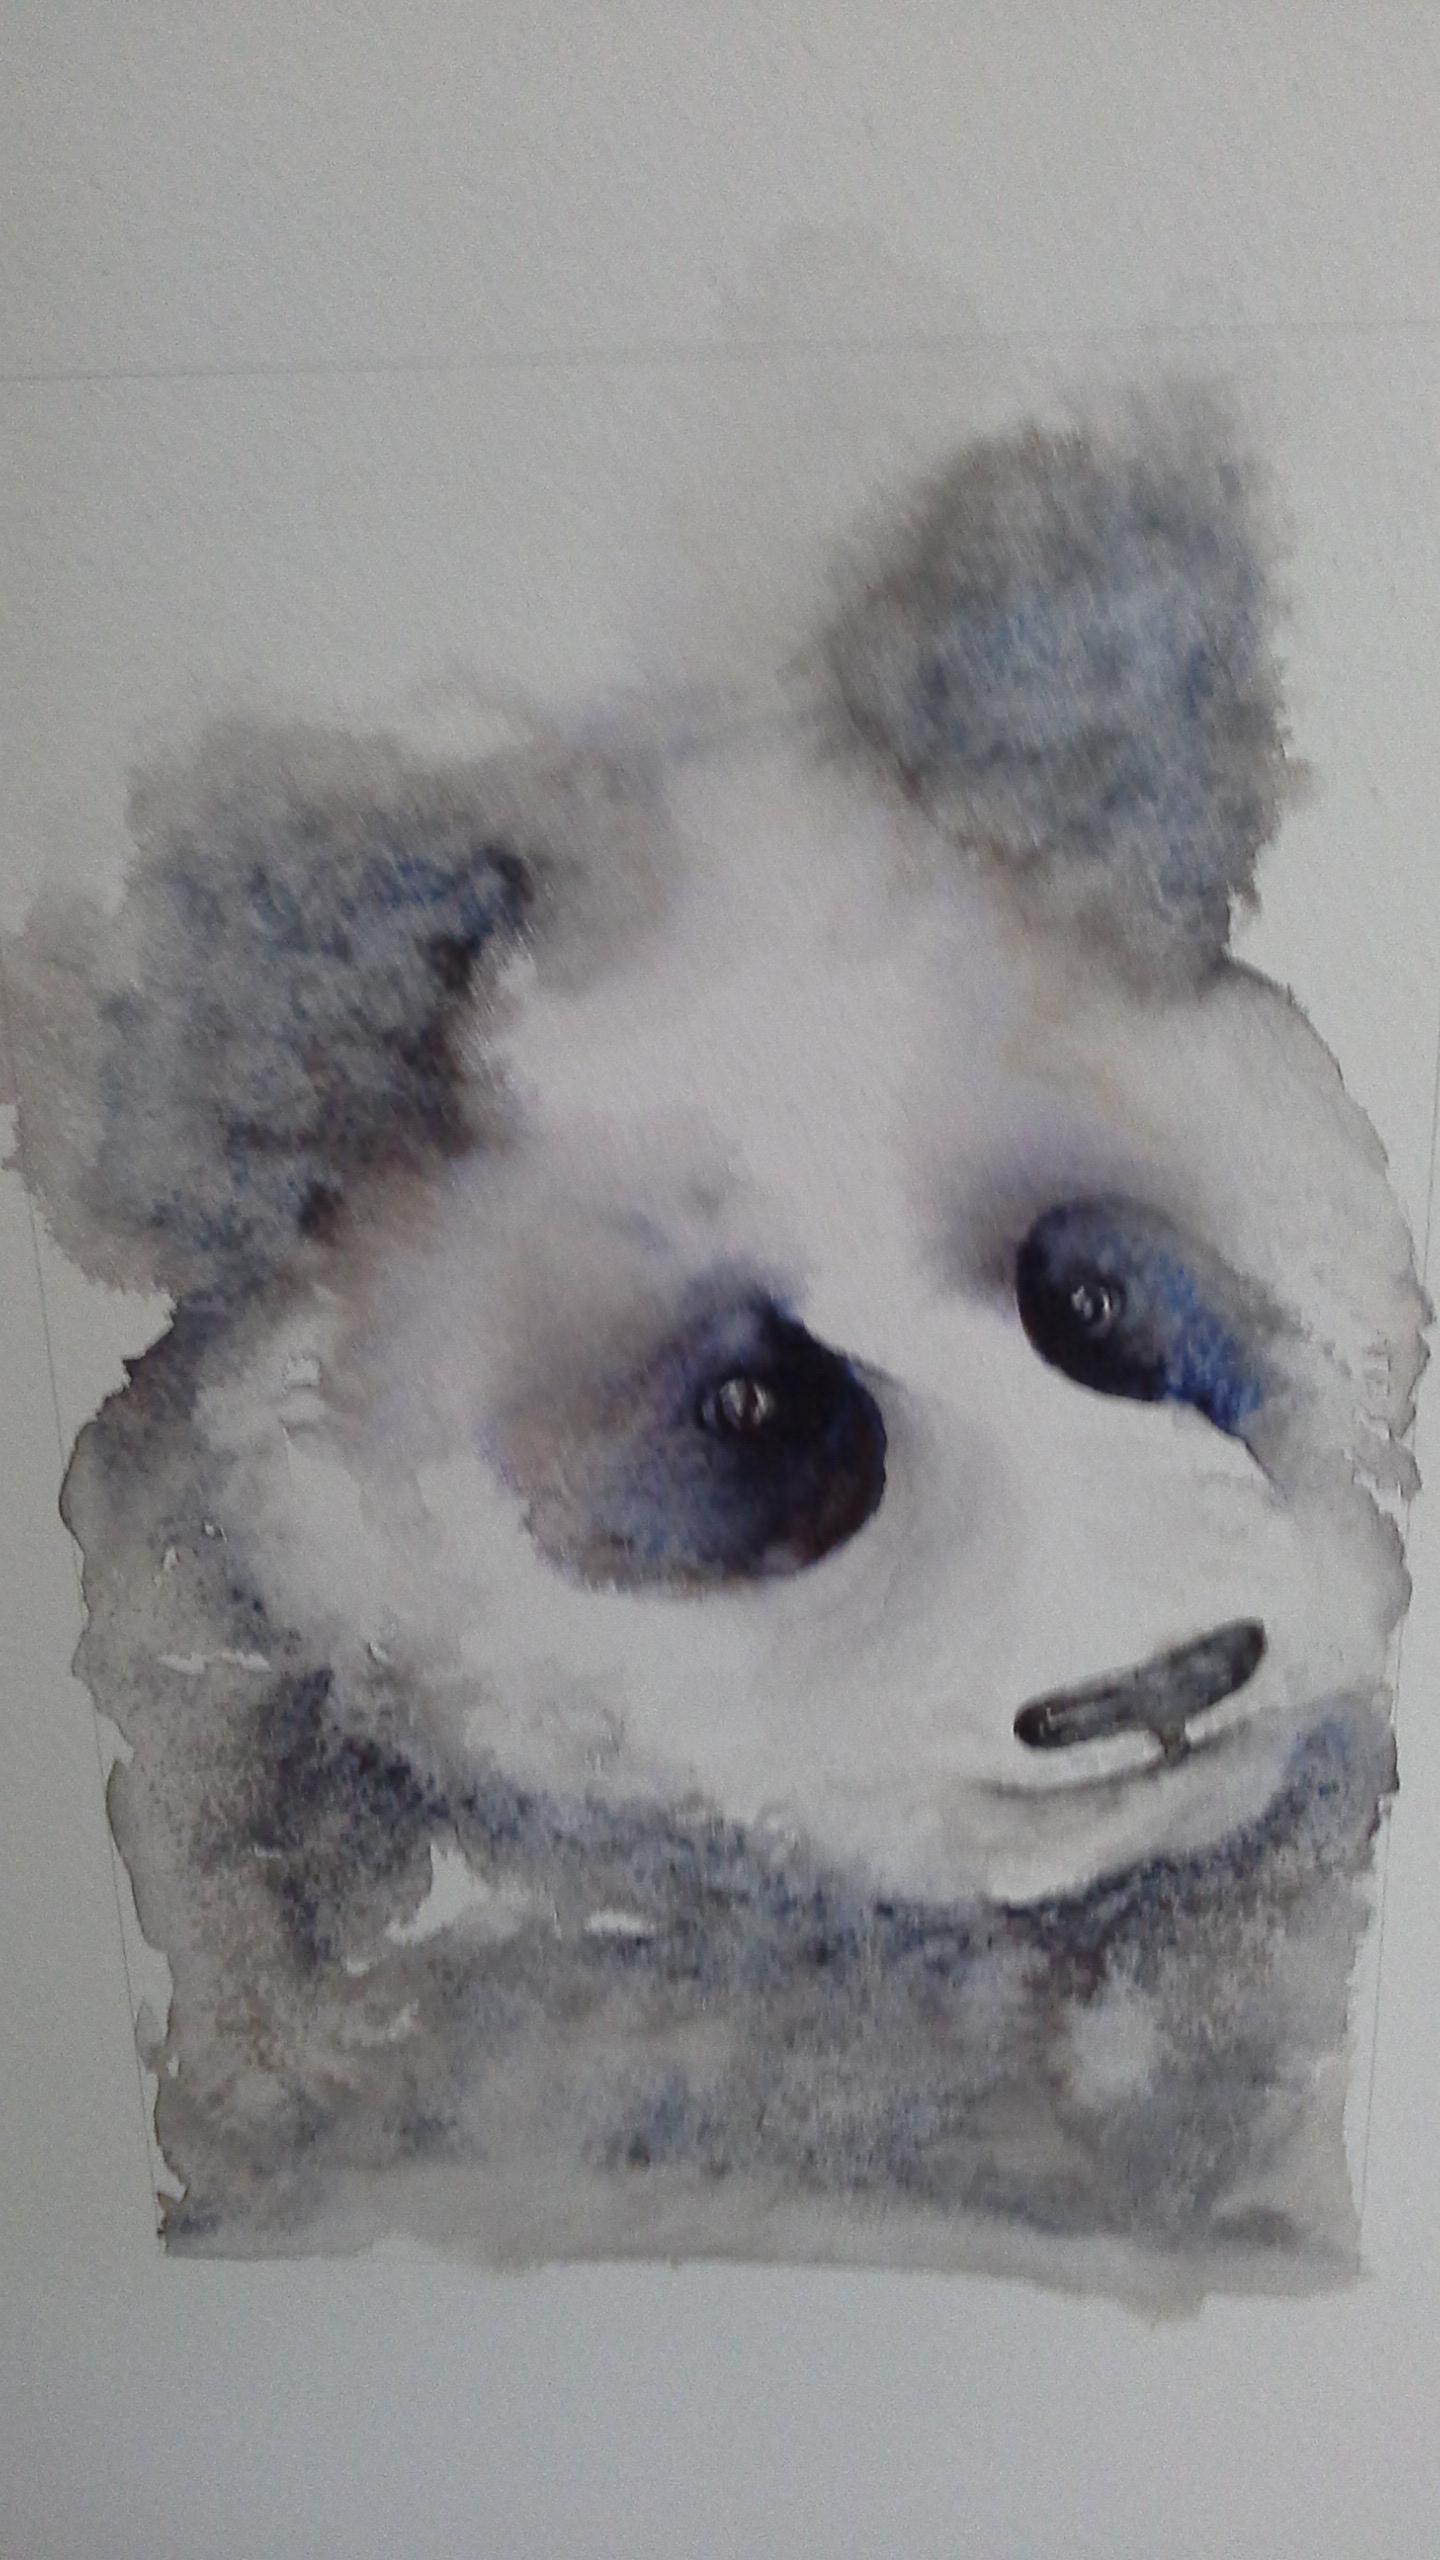 Pandappeal